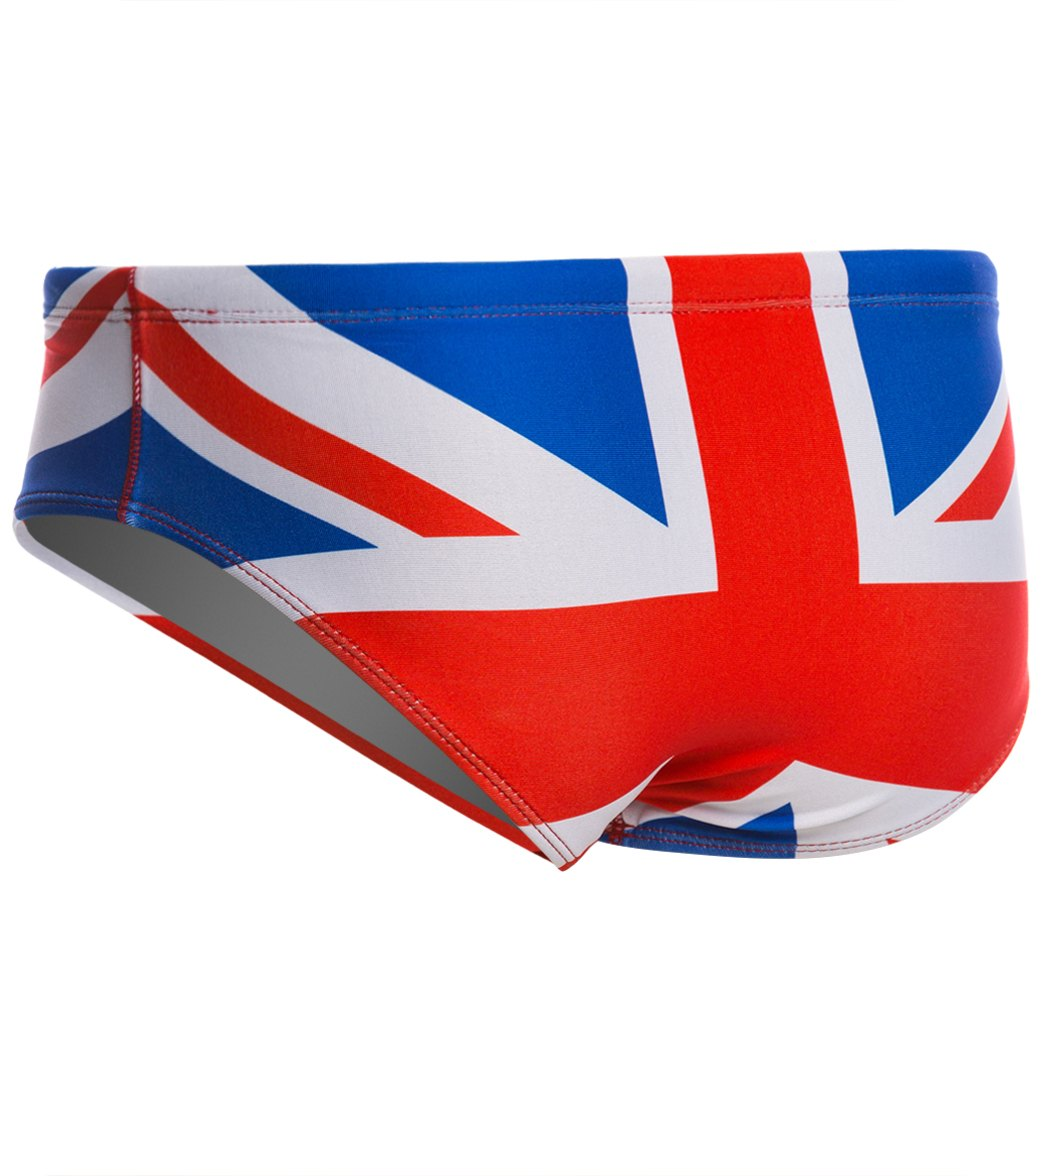 33fb706fb1 Splish Union Jack Brief Swimsuit at SwimOutlet.com